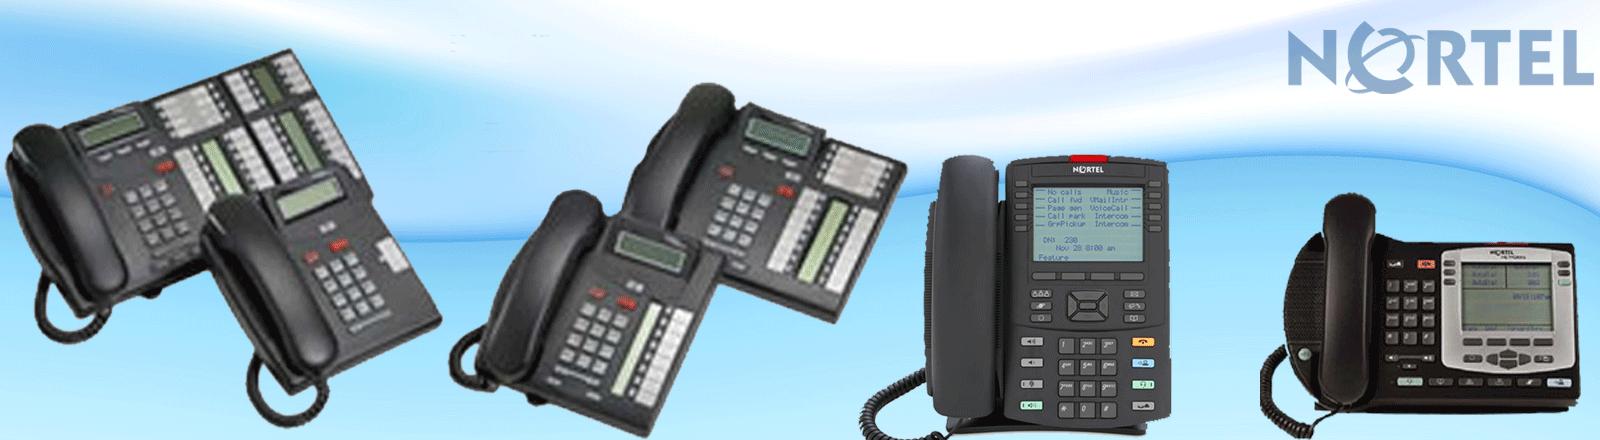 Nortel telephone Repair